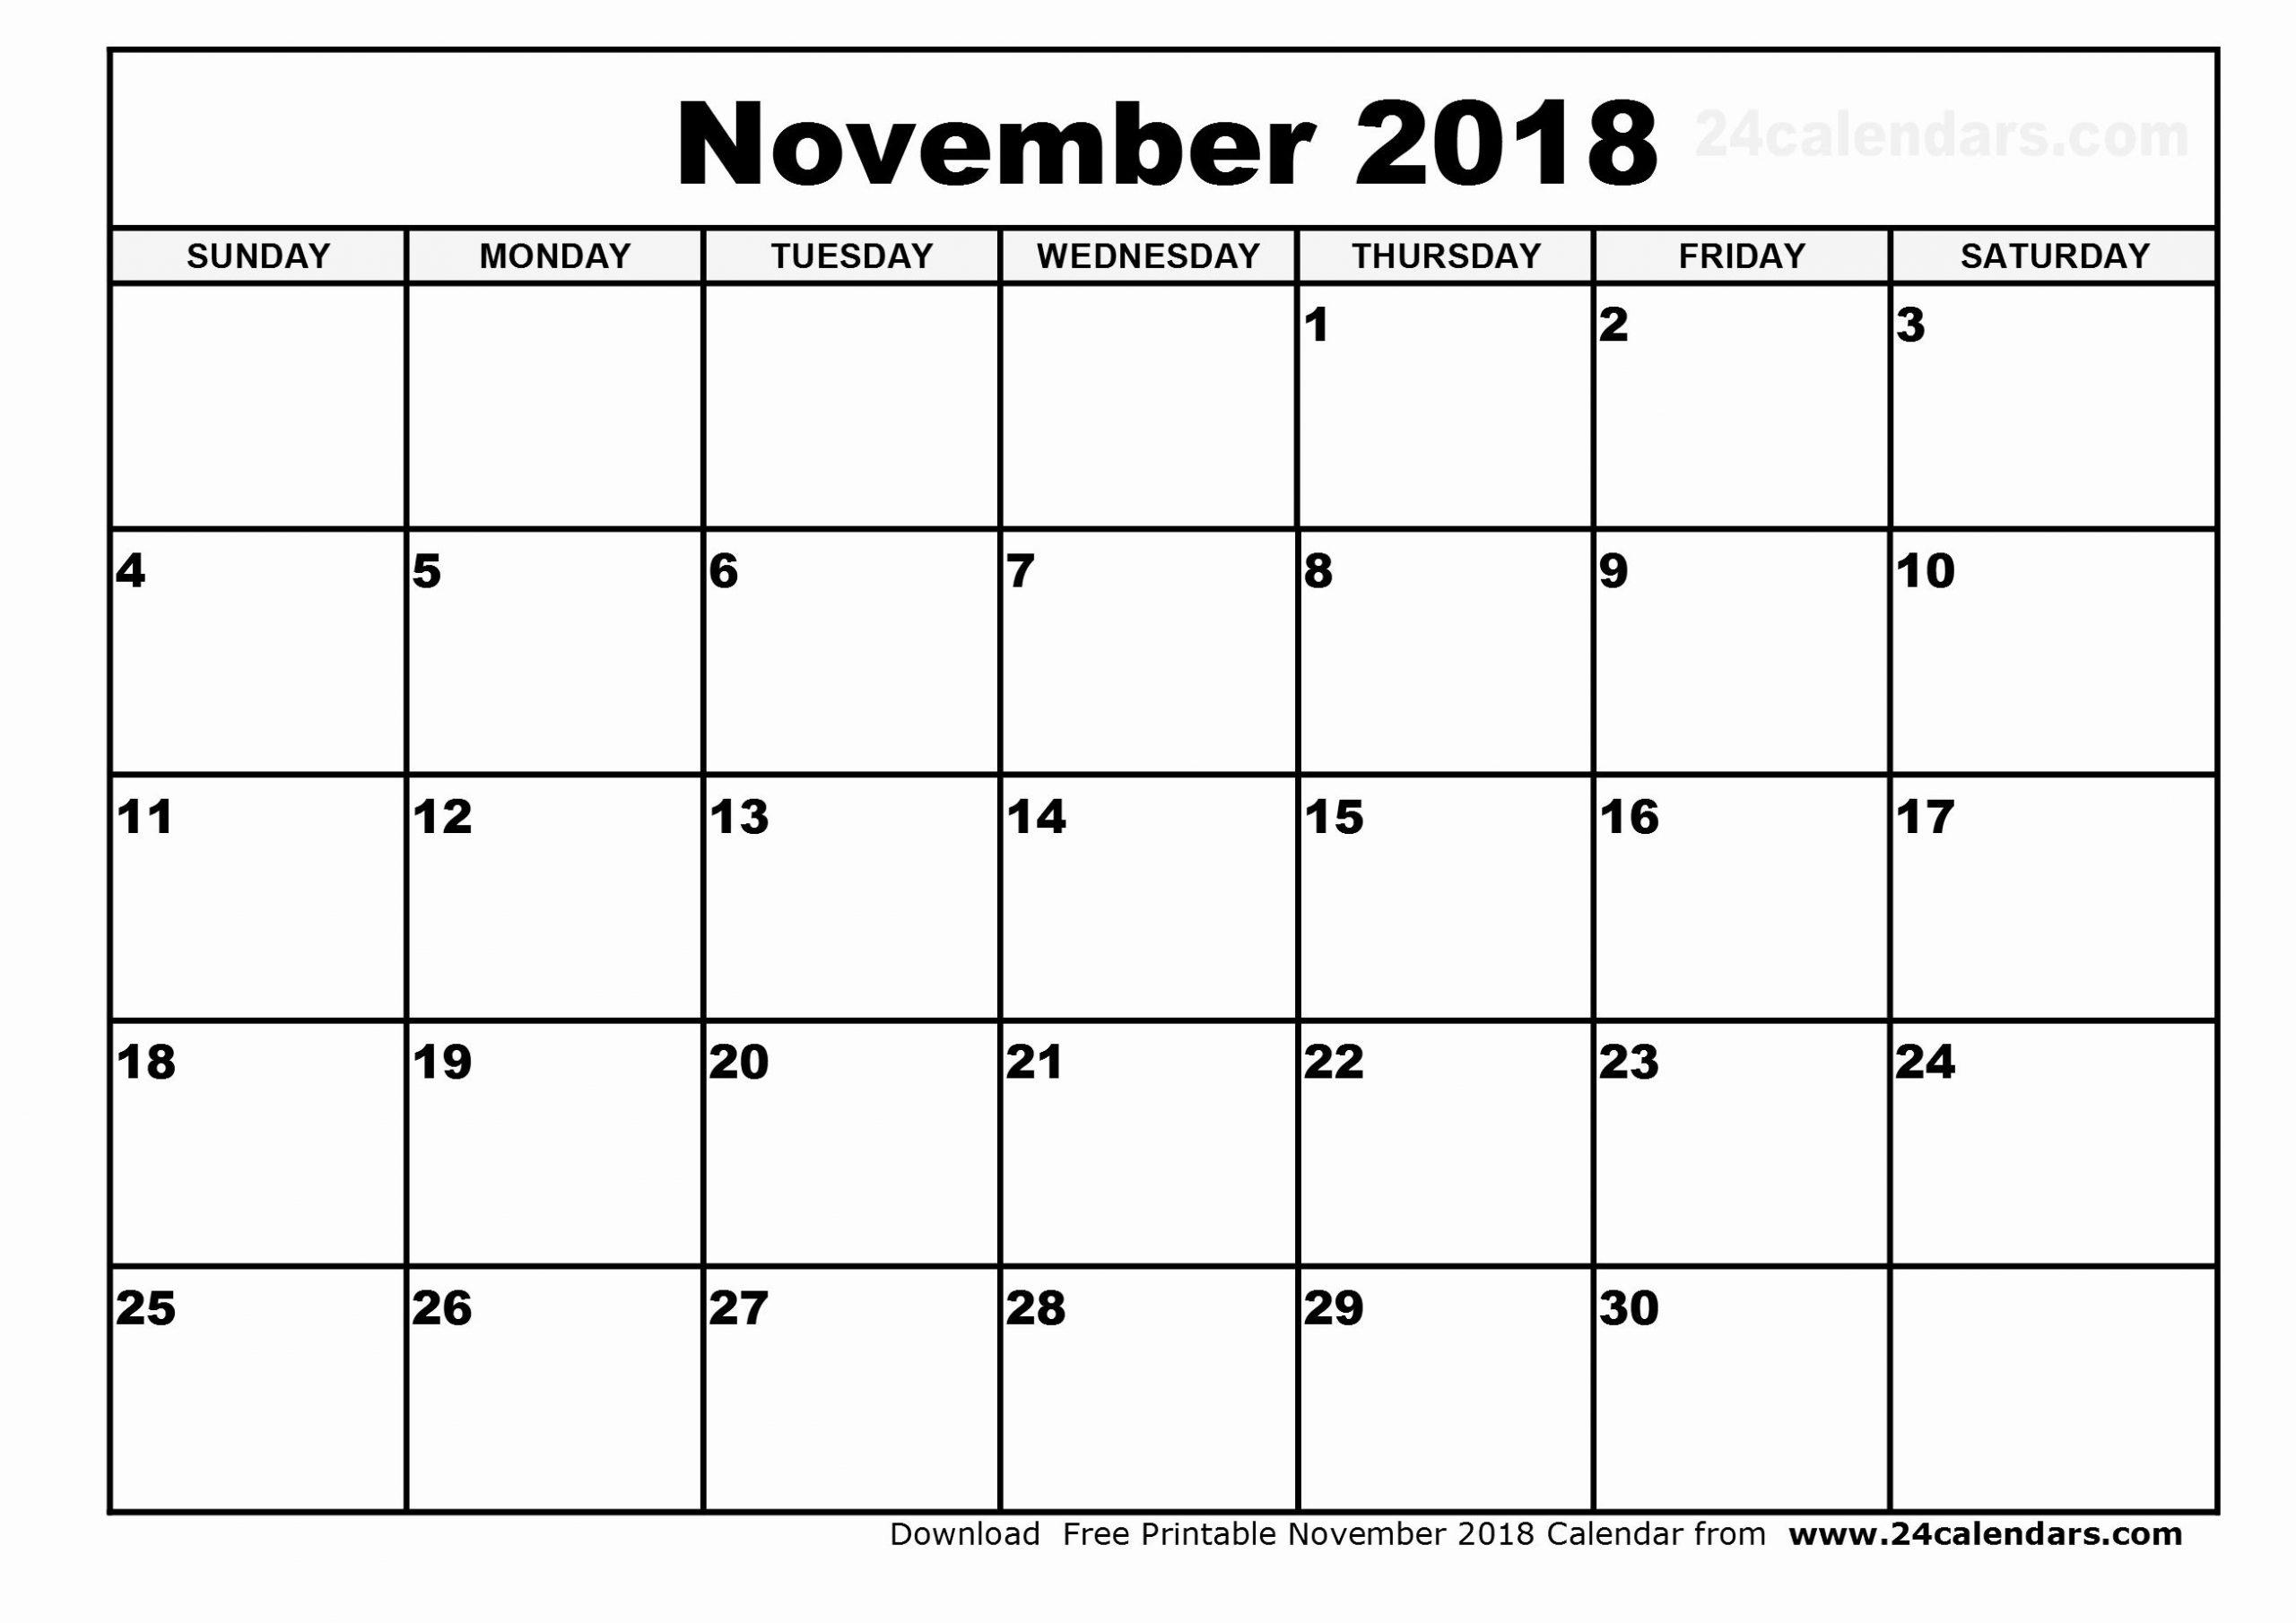 Catch November 2018 Calendar Printable Monthly